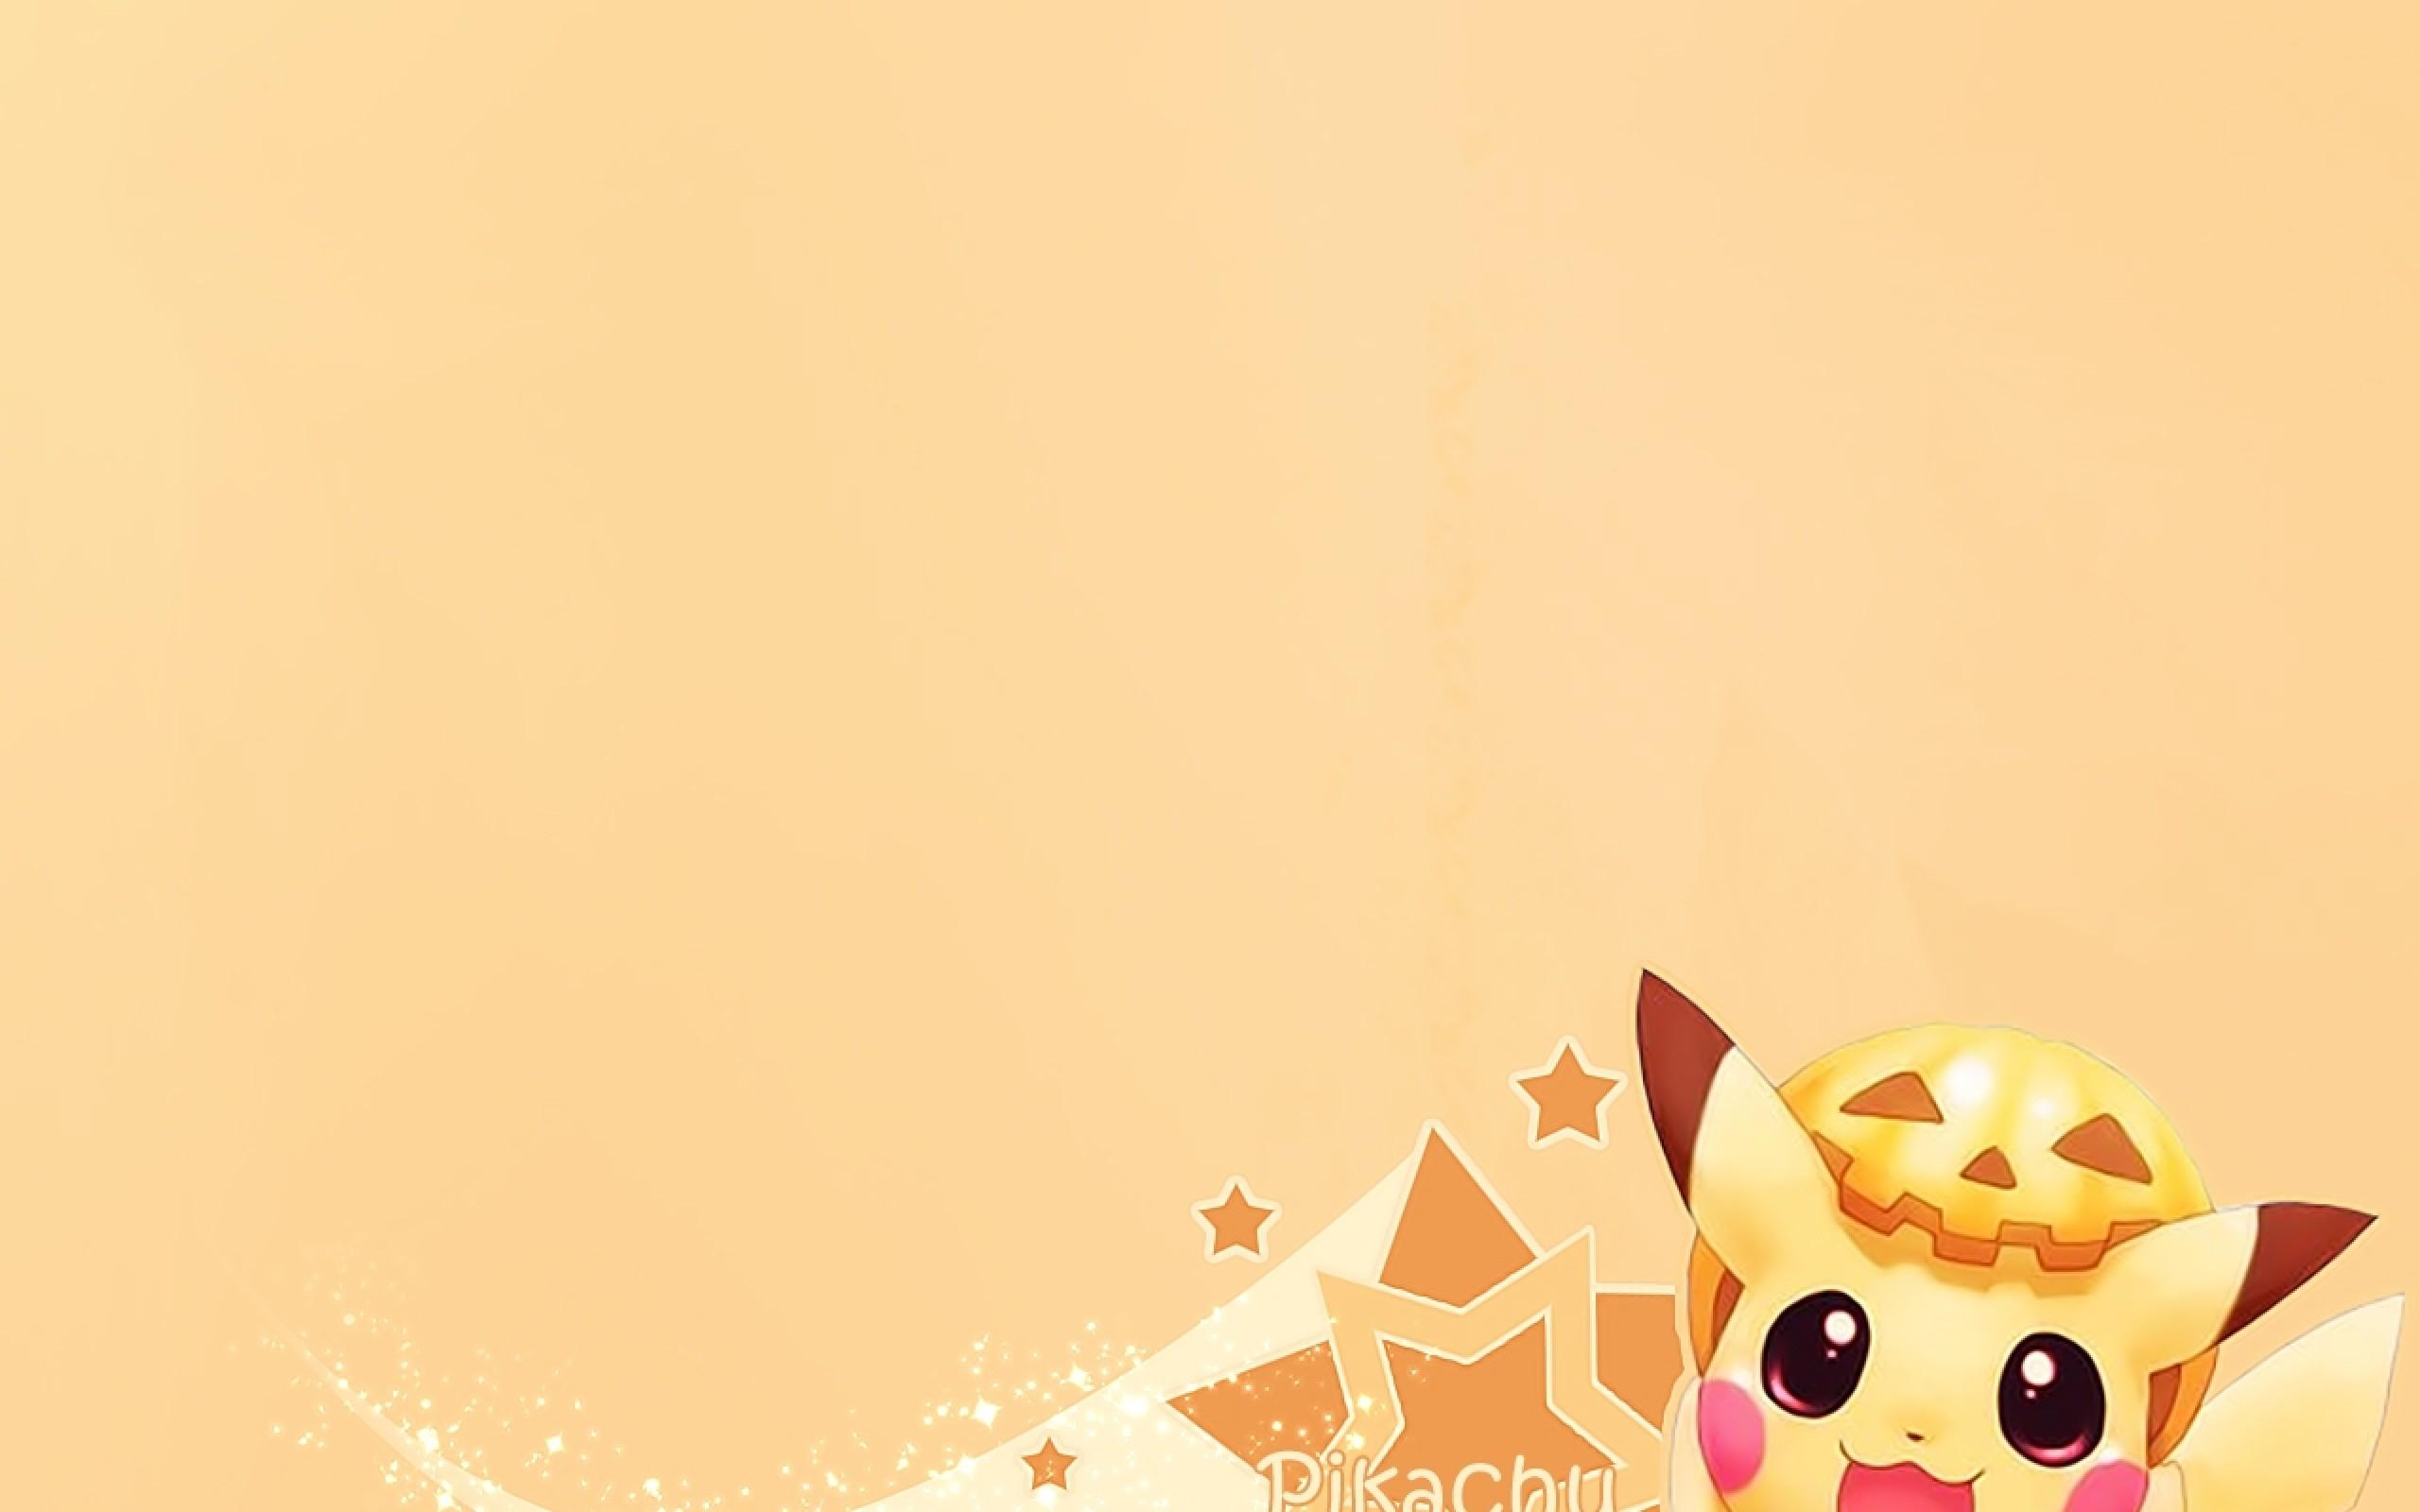 Cute Toothless Desktop Wallpaper Cute Pokemon Backgrounds 183 ① Wallpapertag